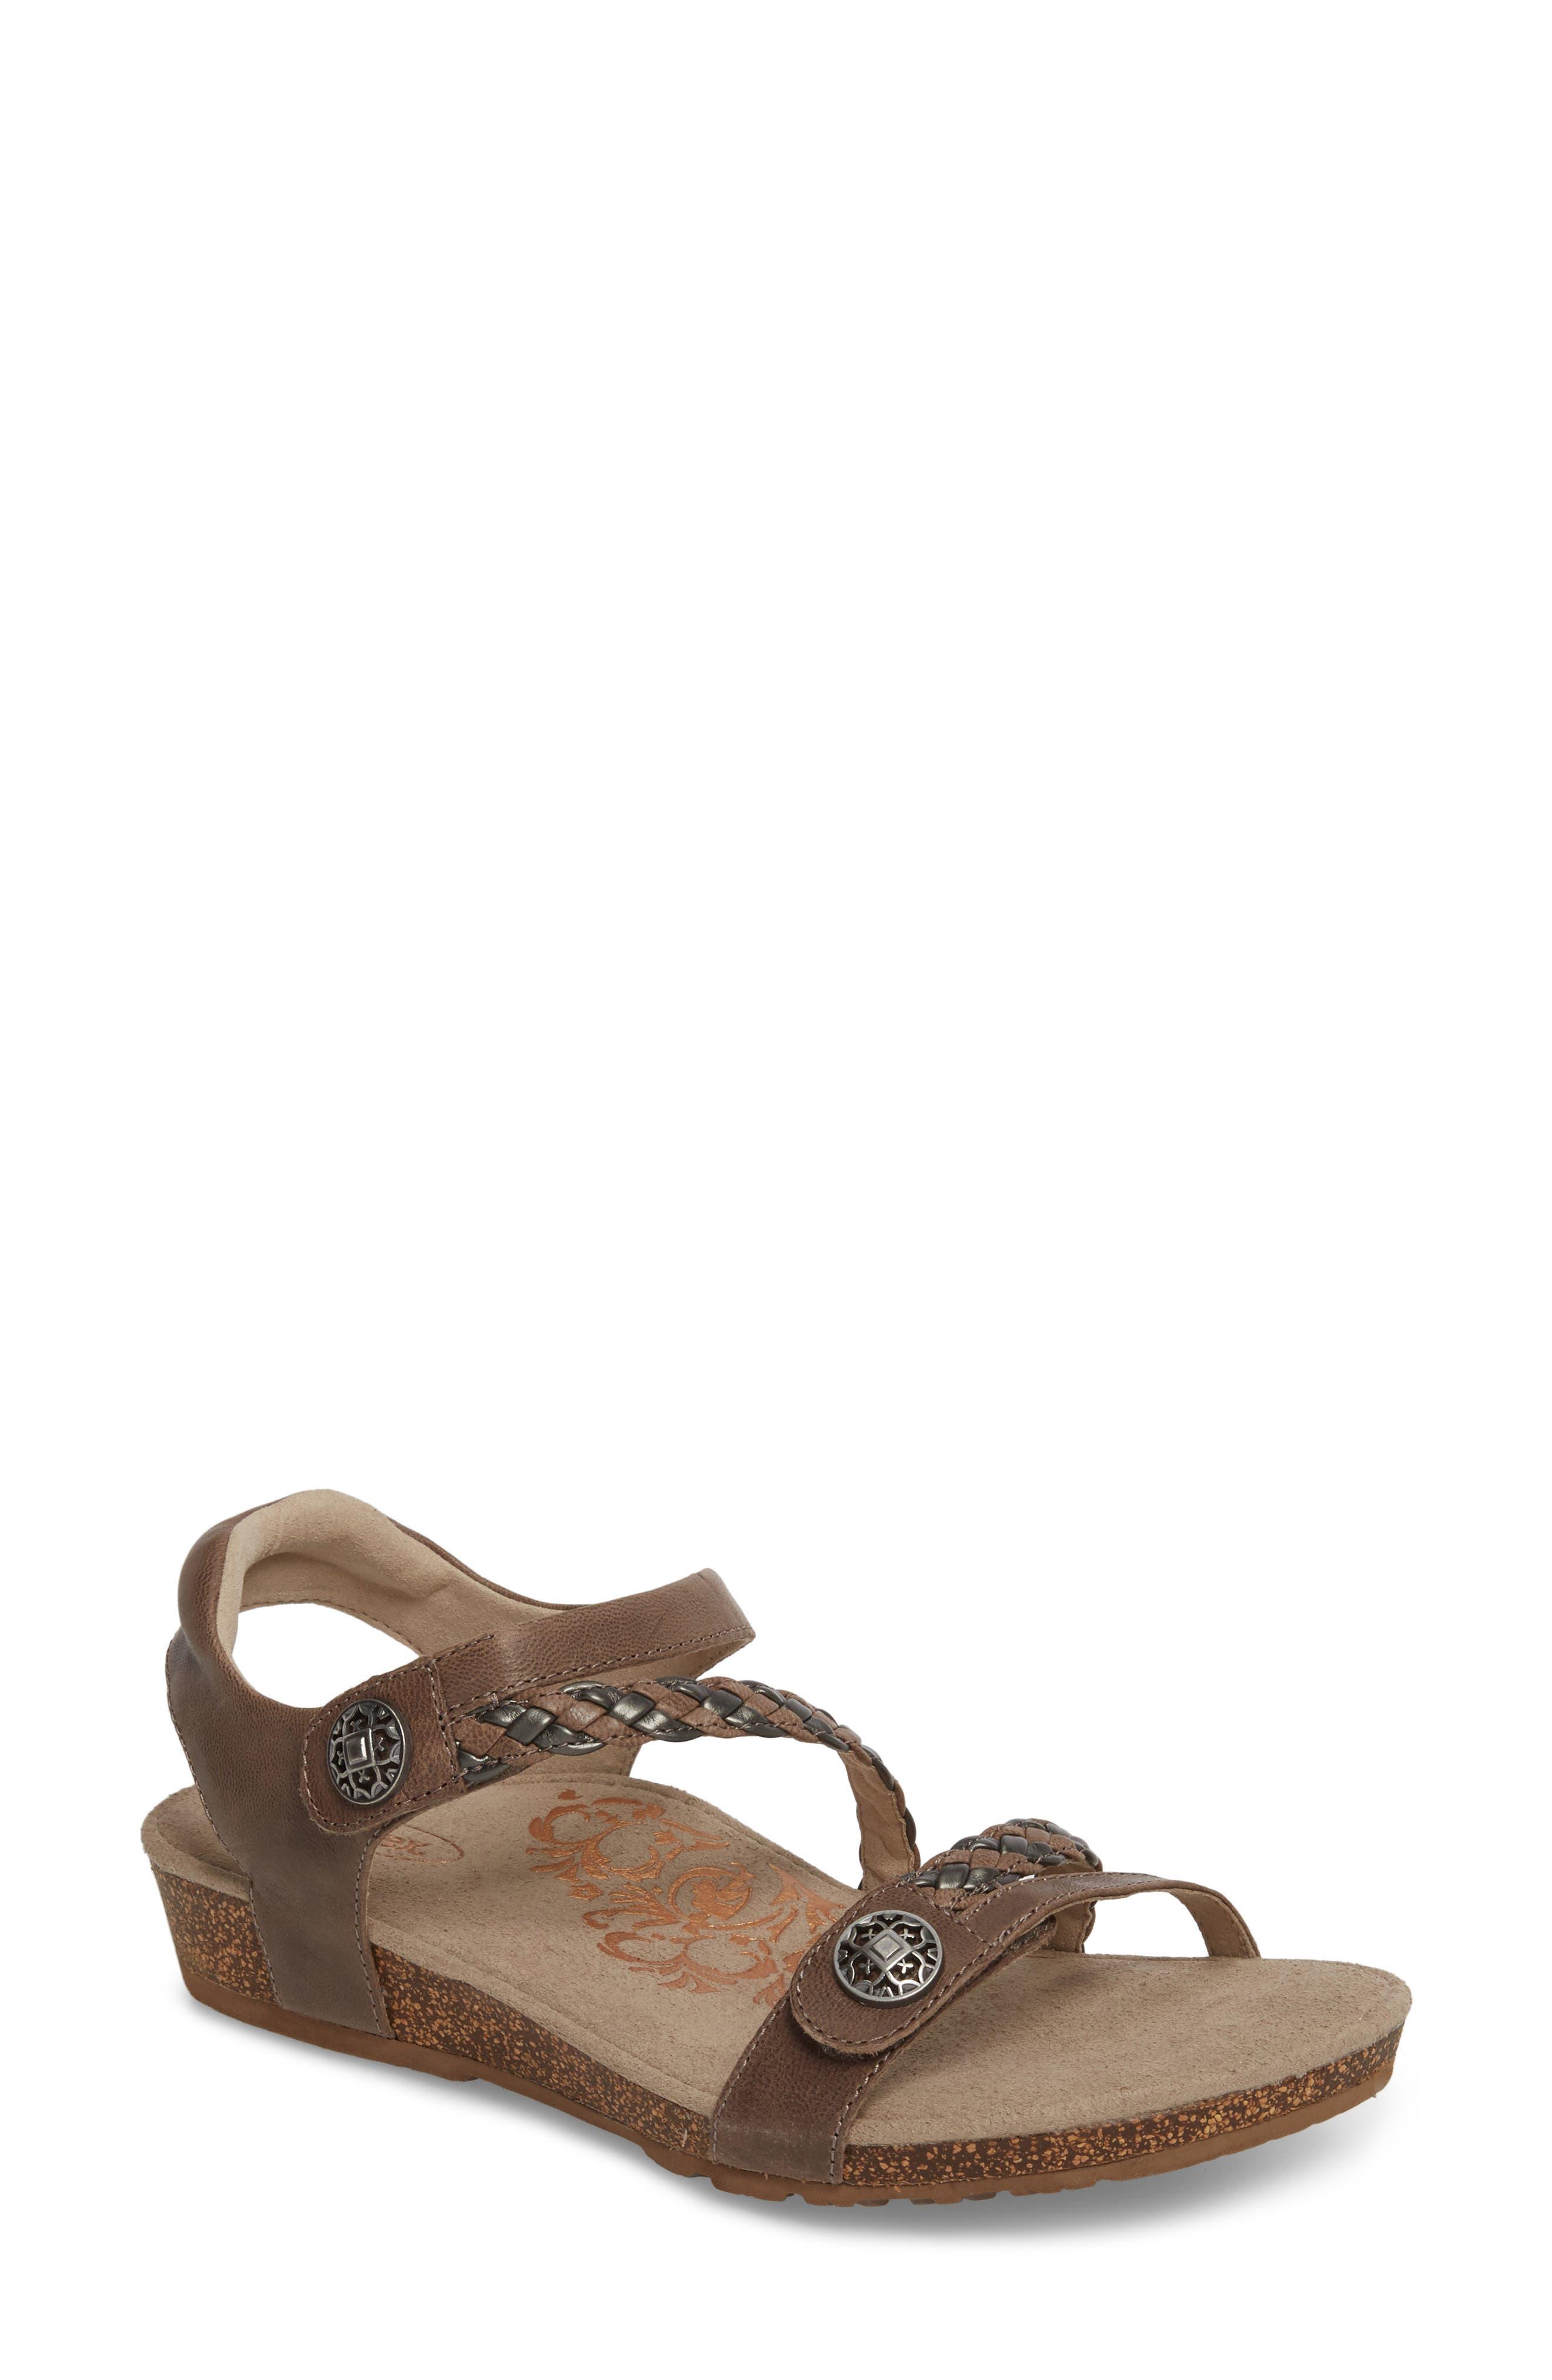 'Jillian' Braided Leather Strap Sandal,                             Main thumbnail 1, color,                             GREY LEATHER